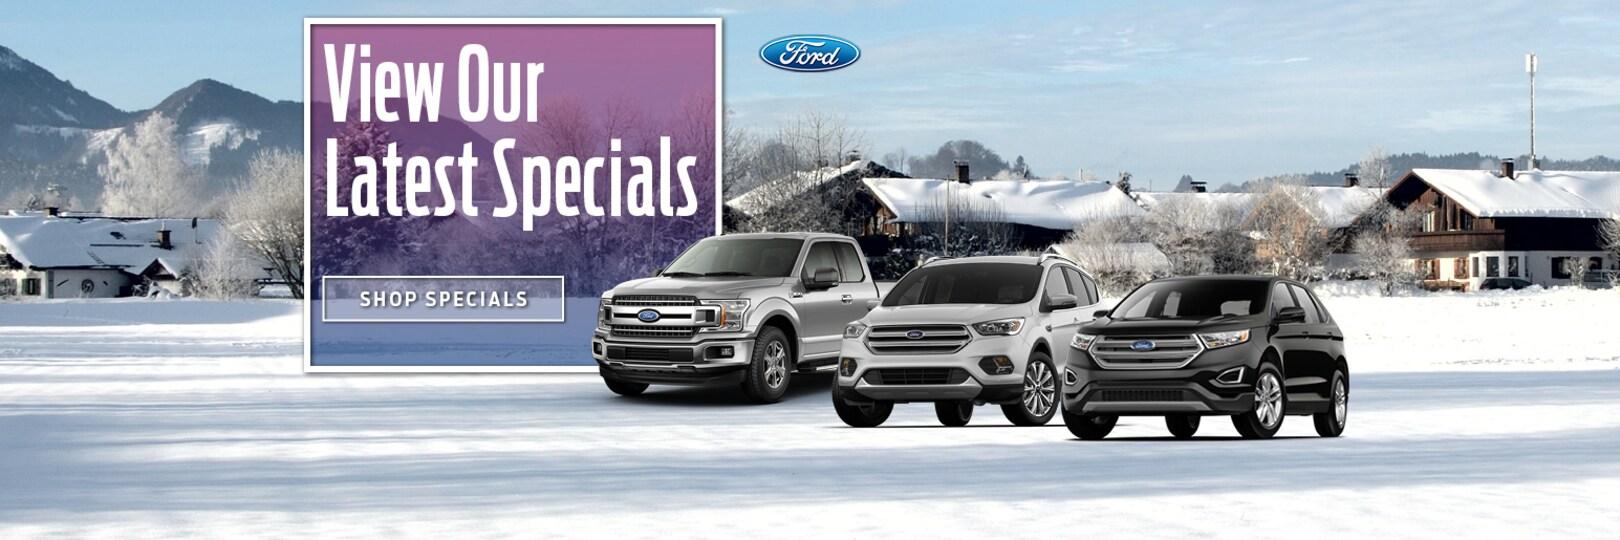 Valenti Auto Mall >> Valenti Ford | Mystic, CT | New & Used Ford Dealership